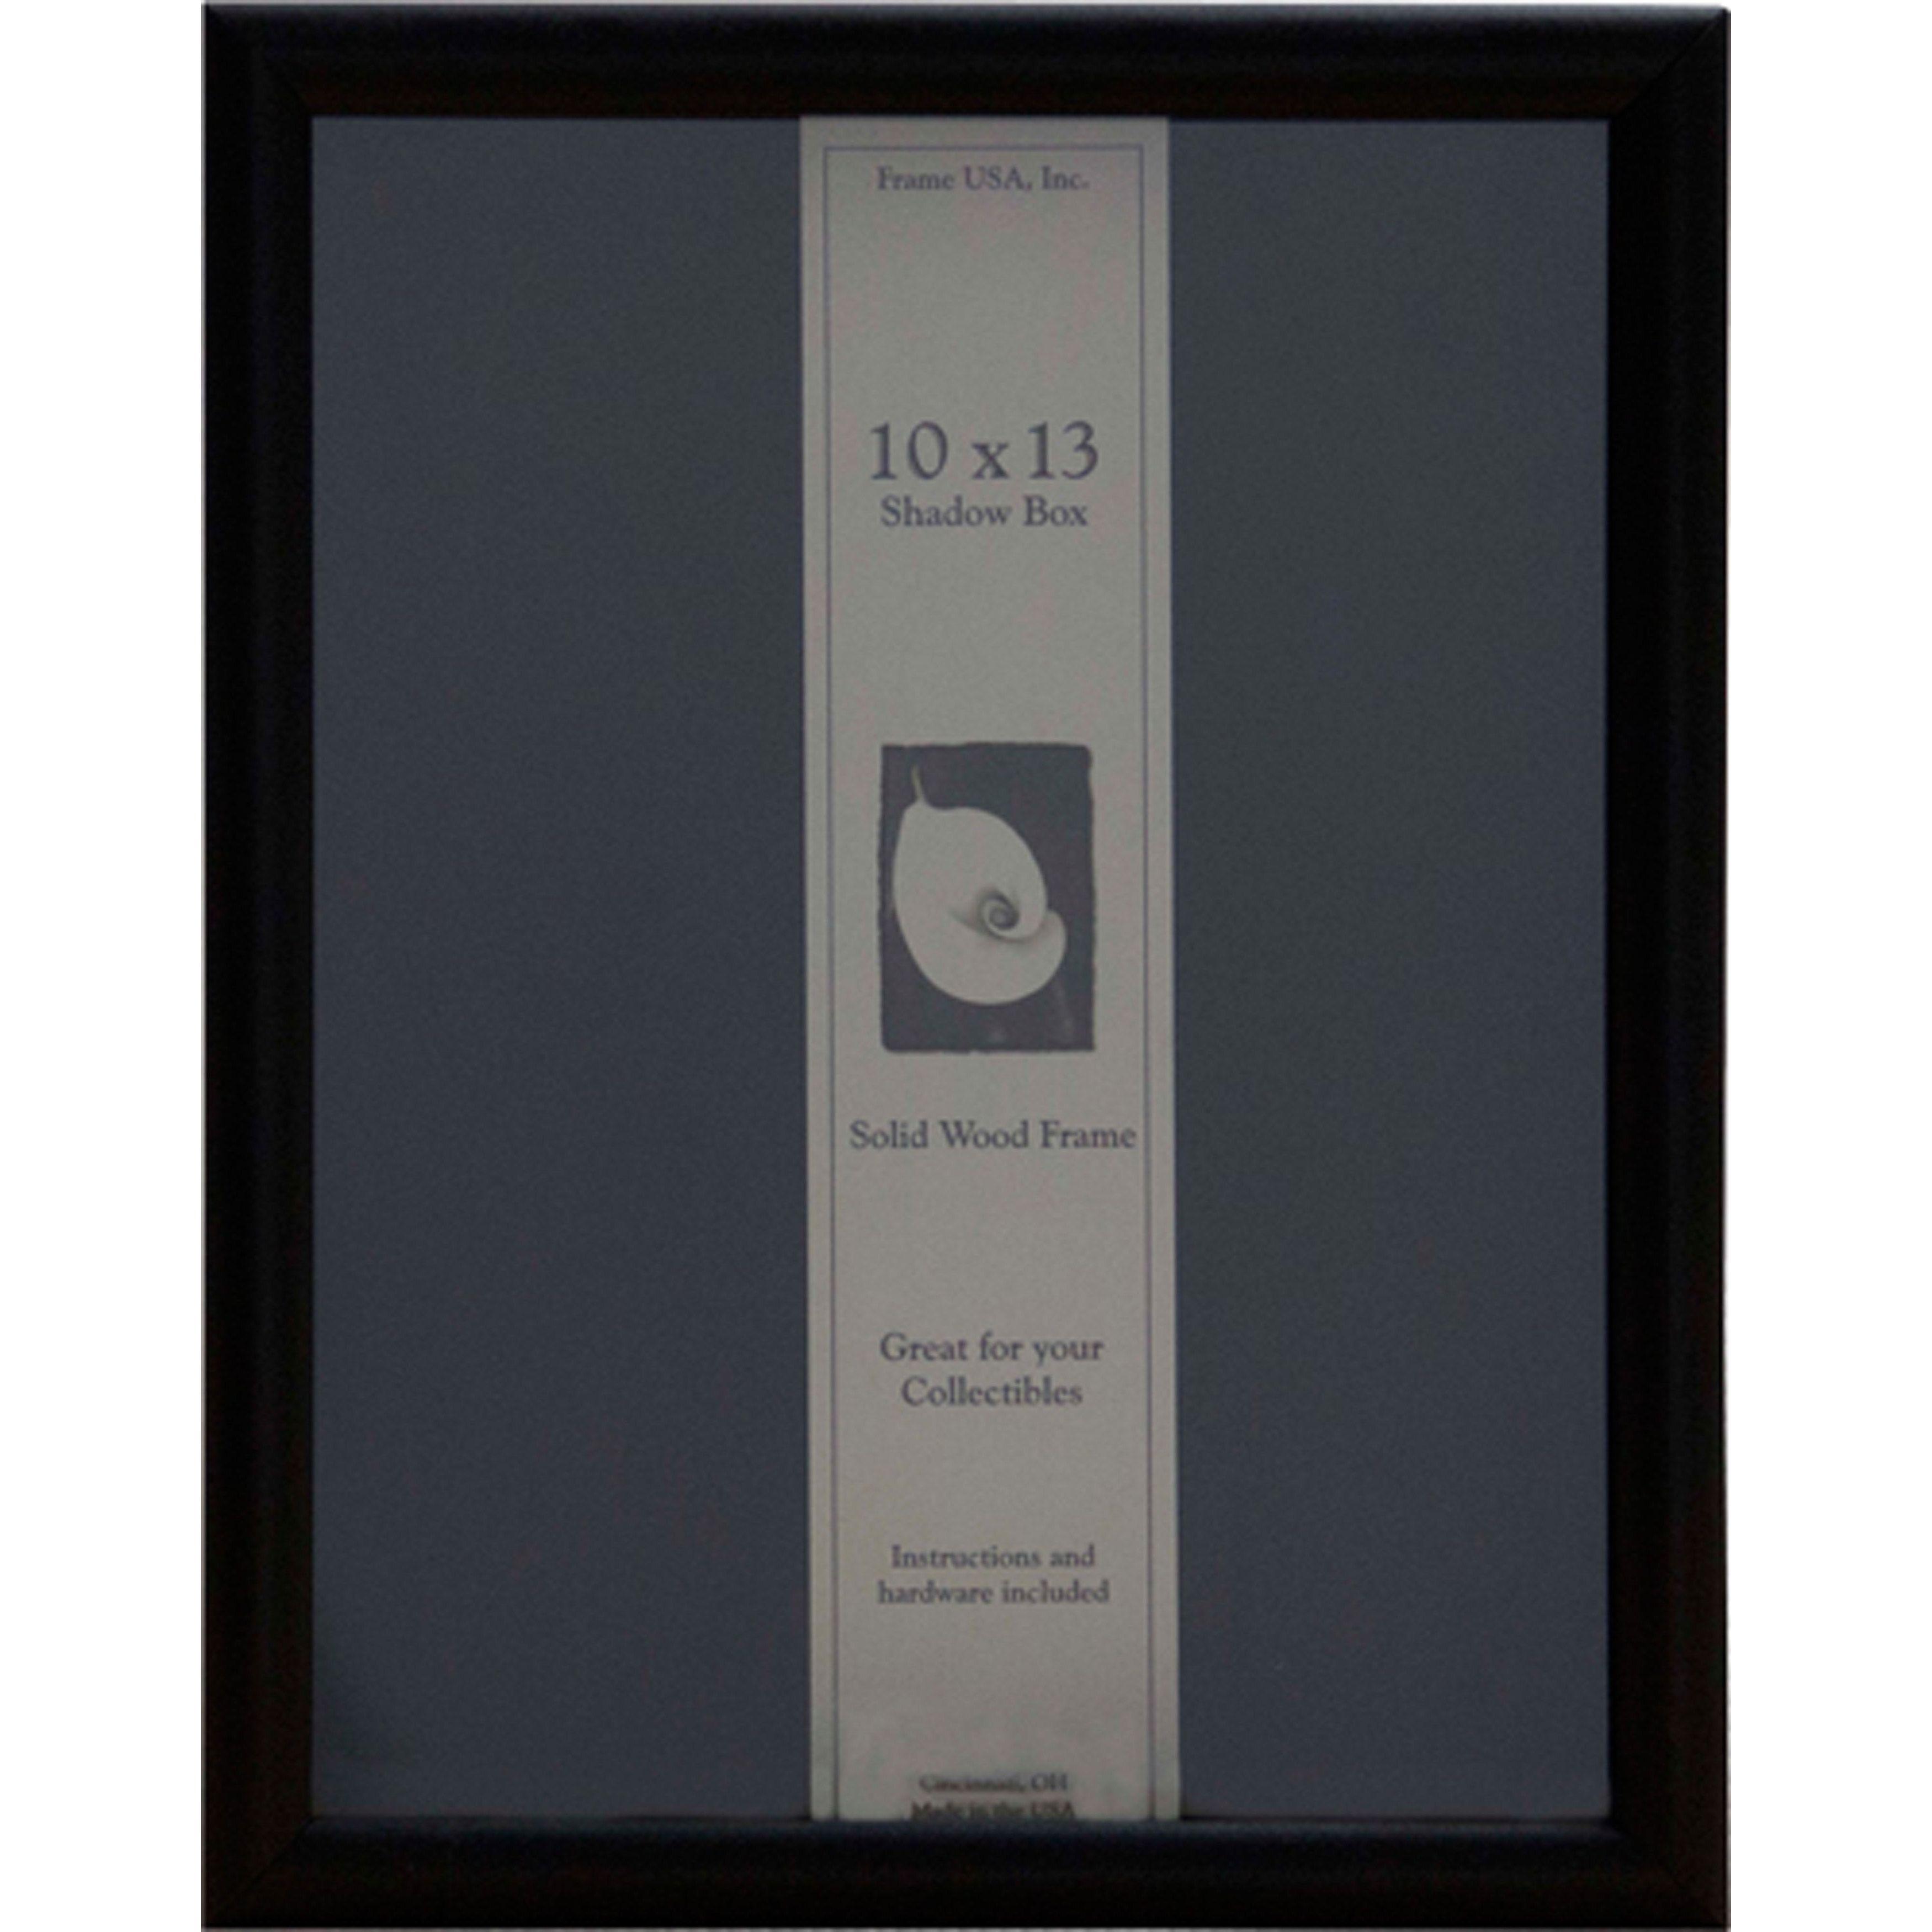 Großzügig 10 X 13 Picture Frame Galerie - Bilderrahmen Ideen ...